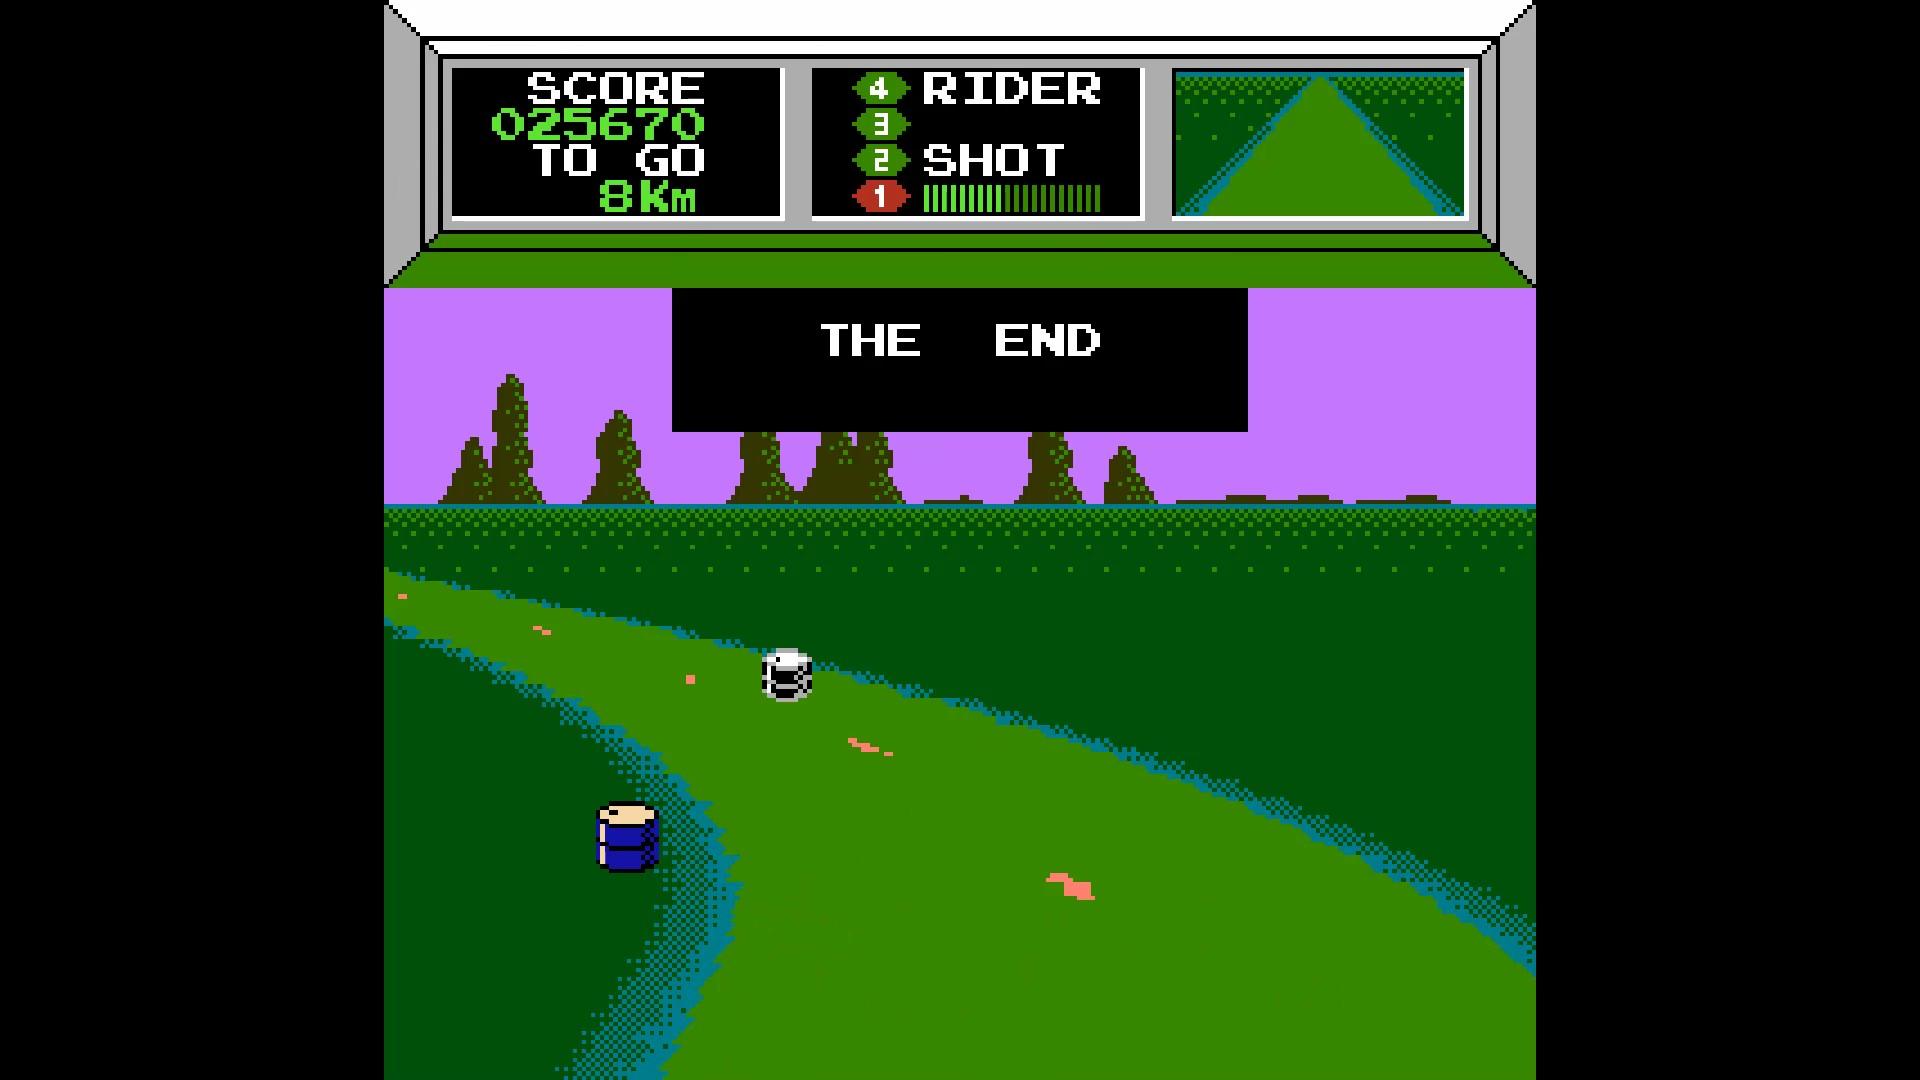 Mach Rider [Fighting Course] 25,670 points